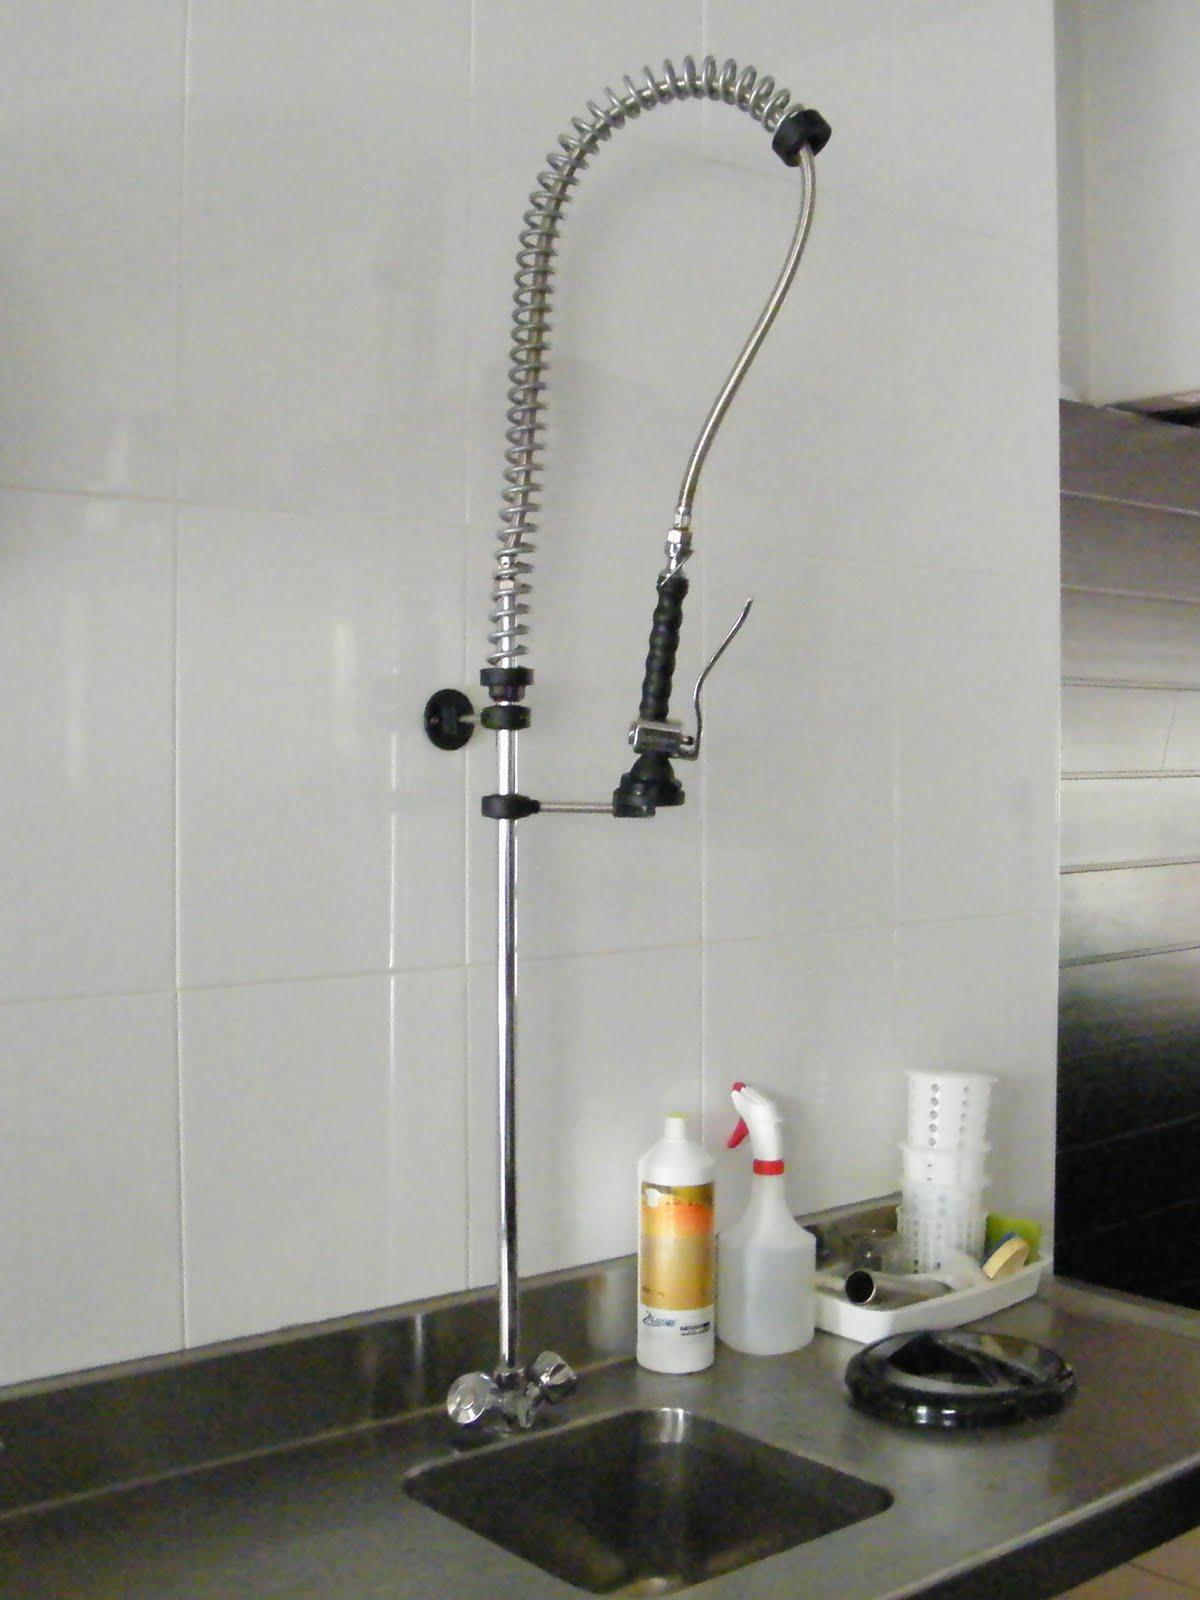 Venta material hosteleria segunda mano grifo de ducha dos for Hosteleria segunda mano